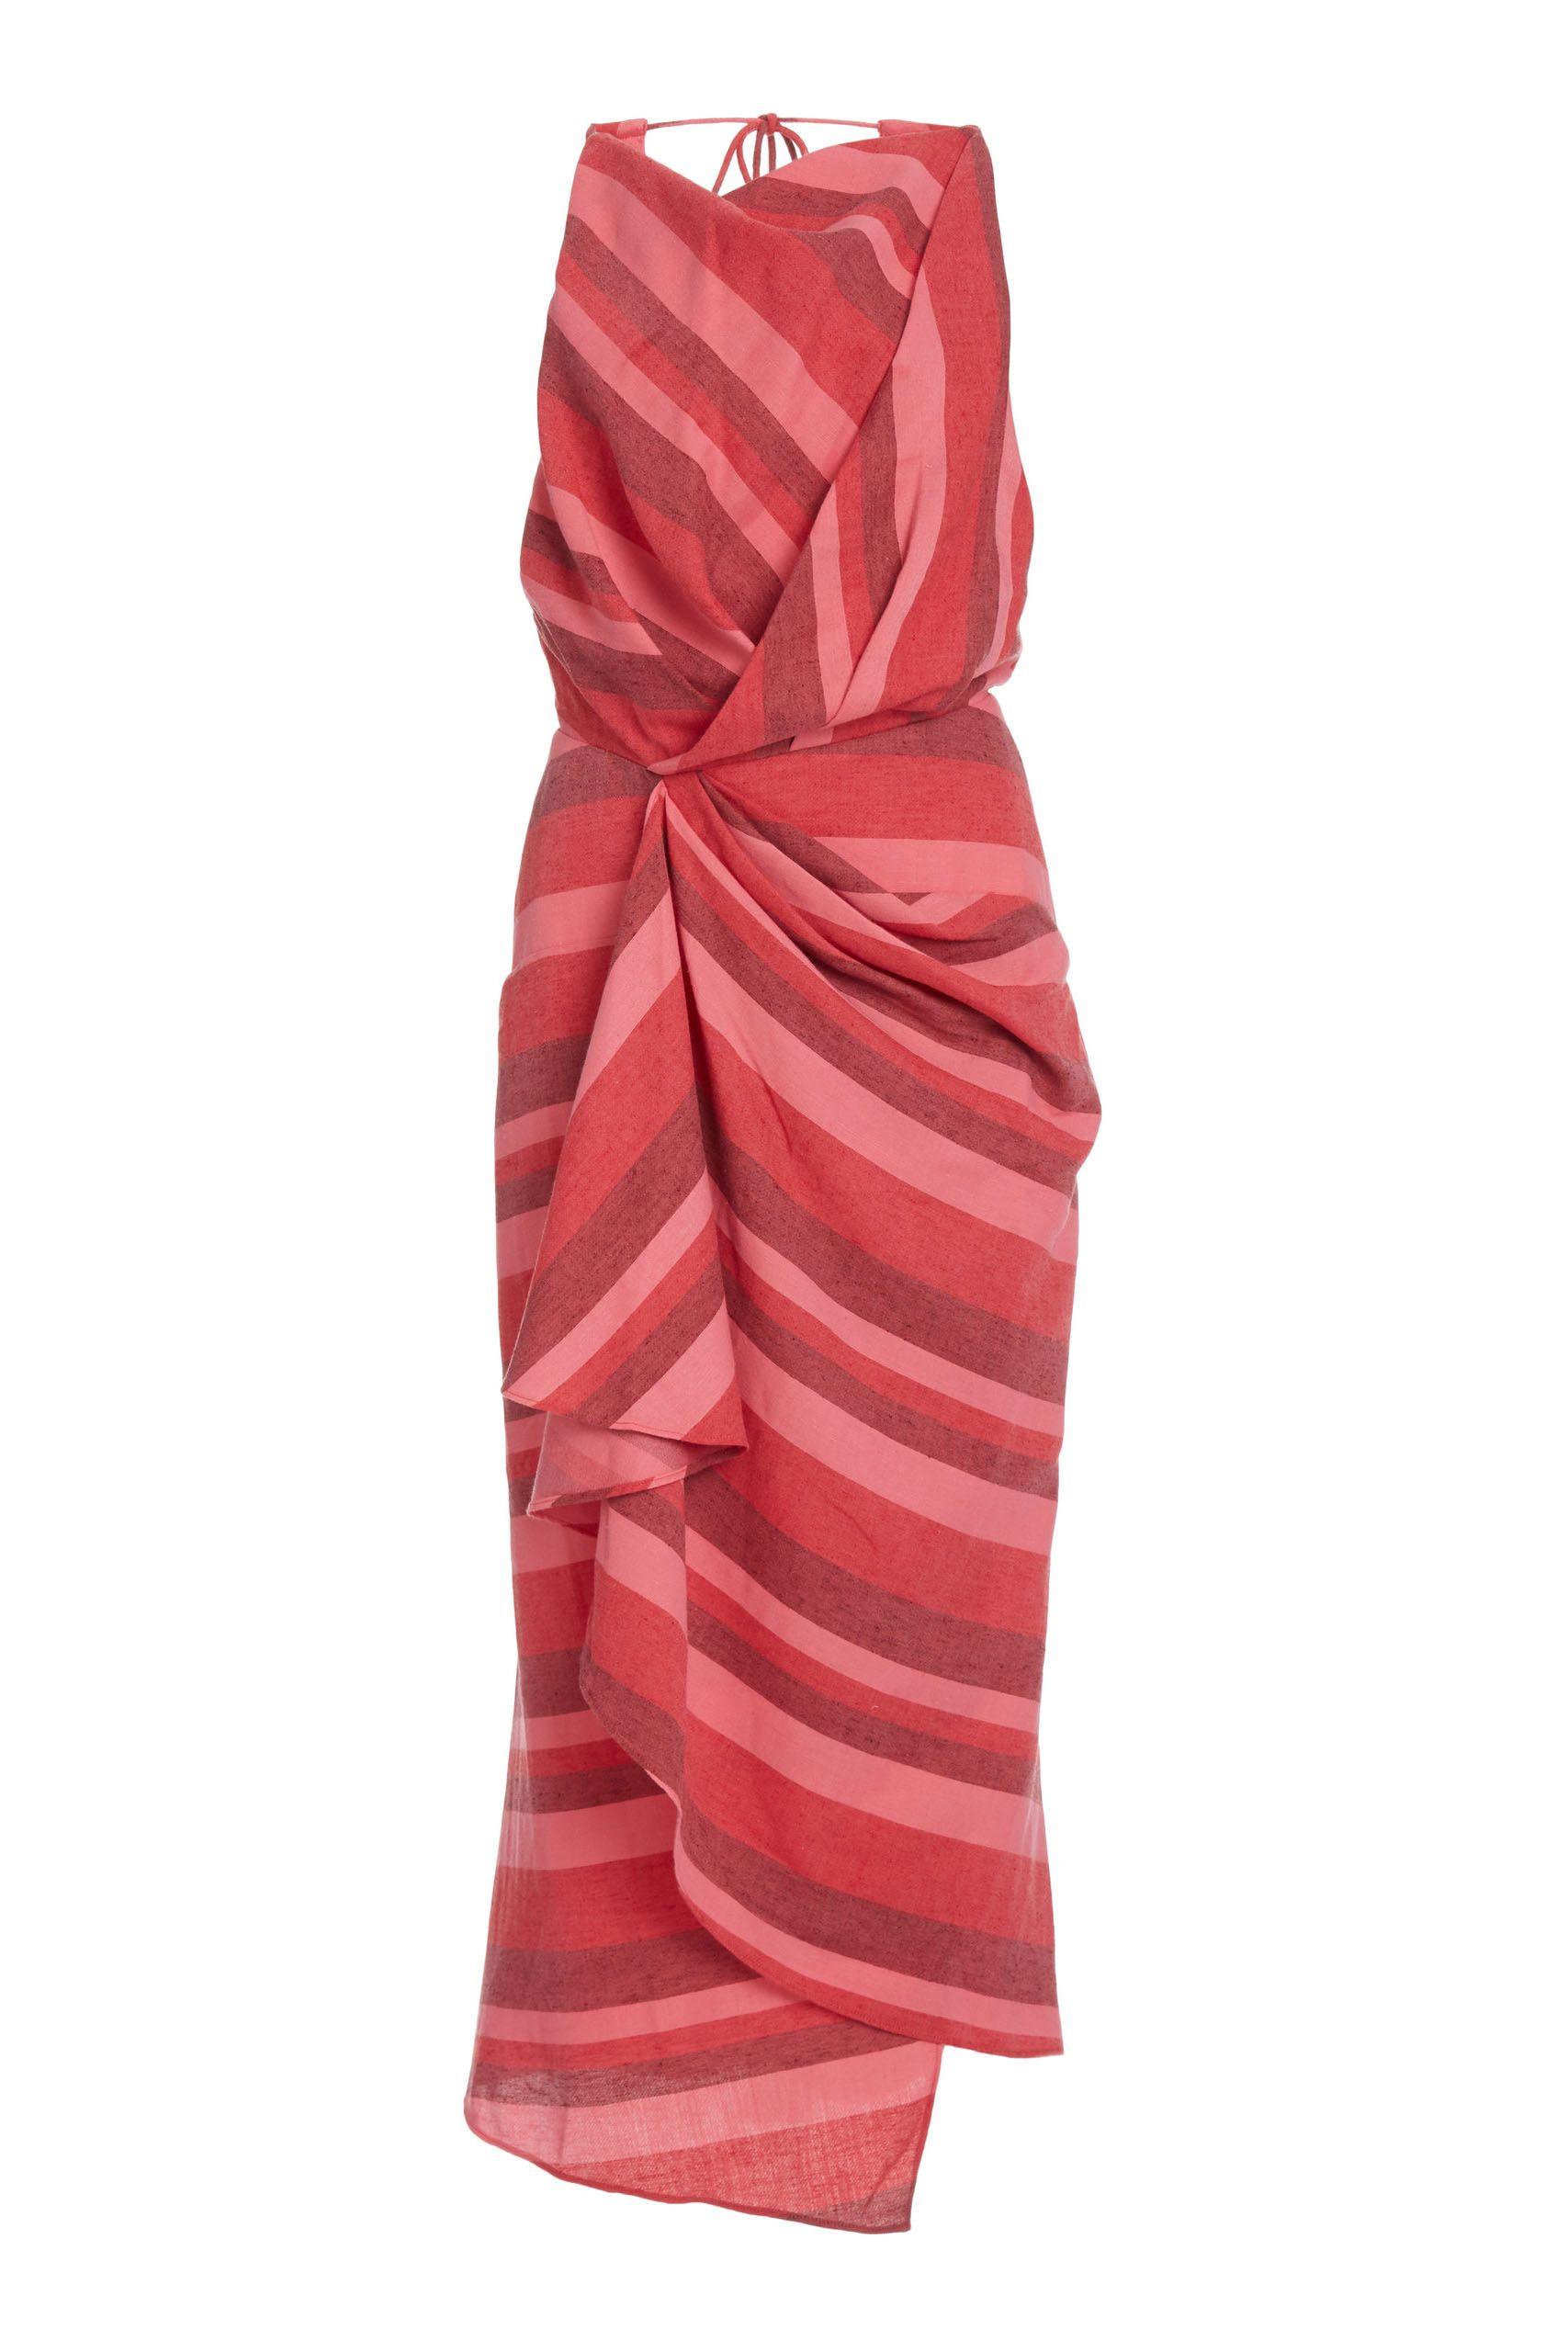 acler-faver-vestido-midi-rojo-fruncido